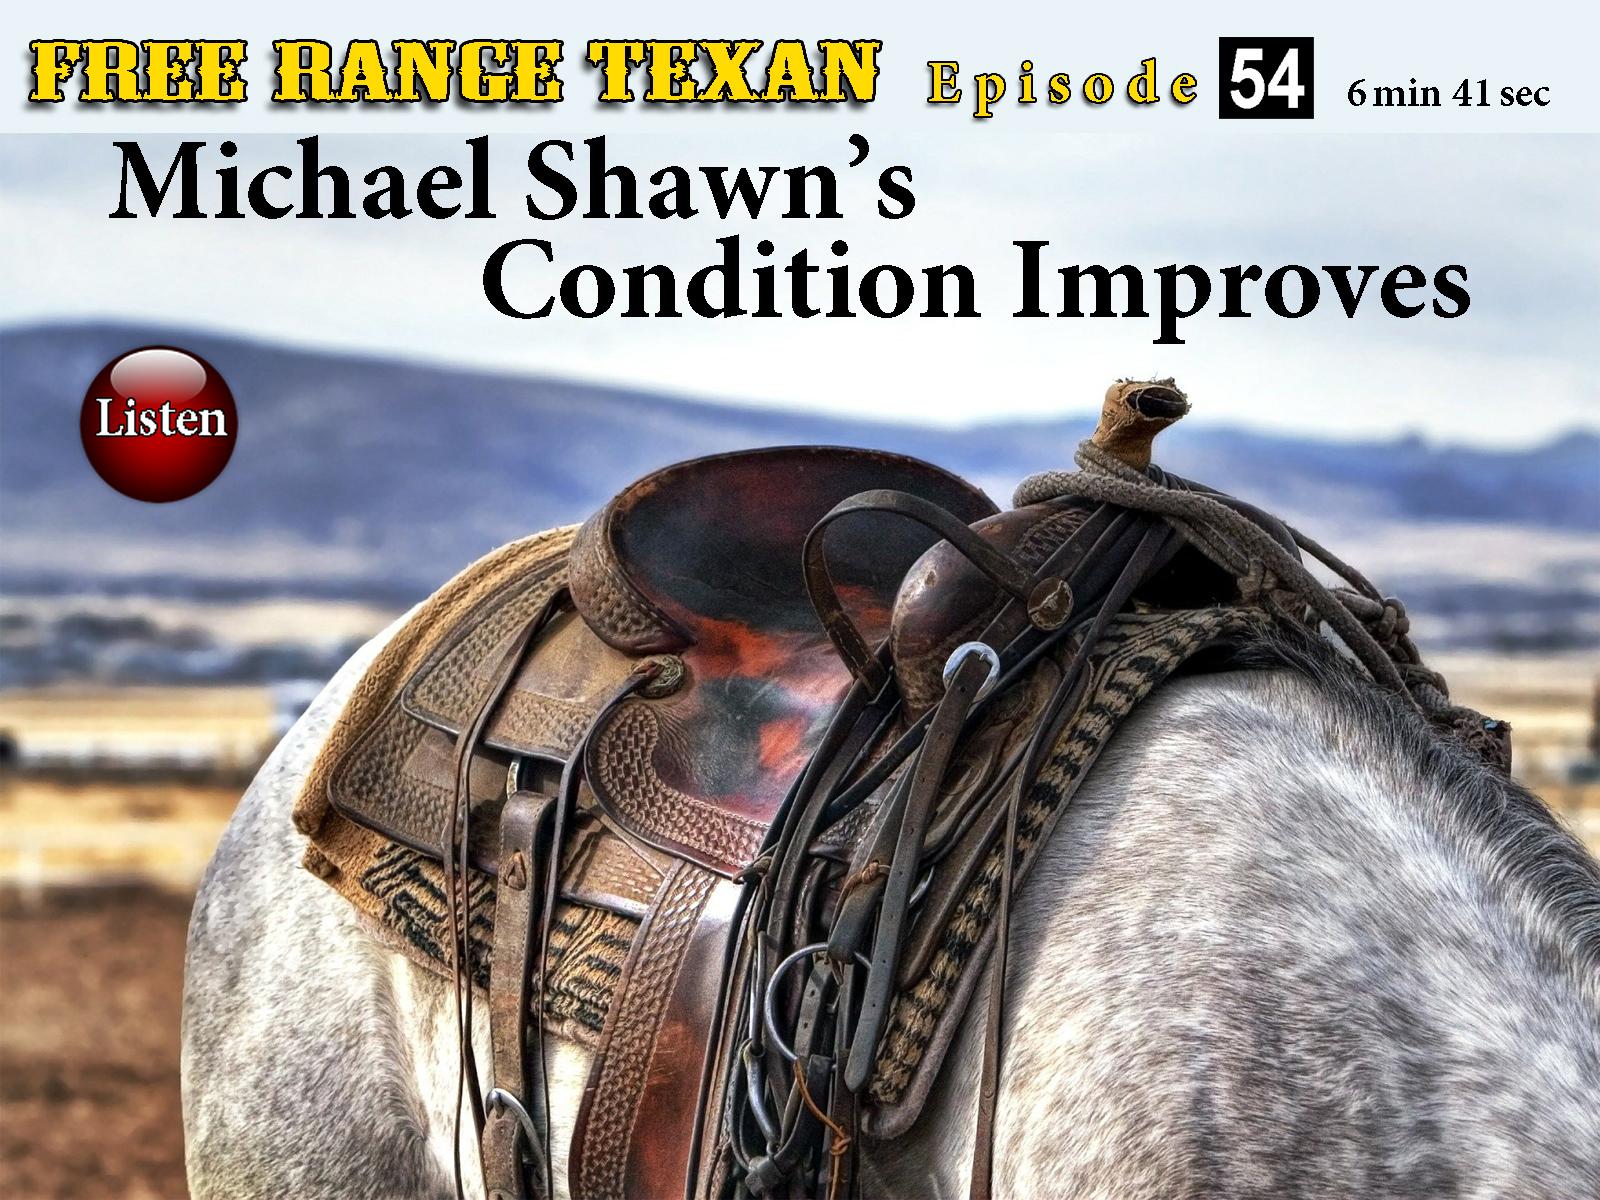 Free Range Texan Episode 54